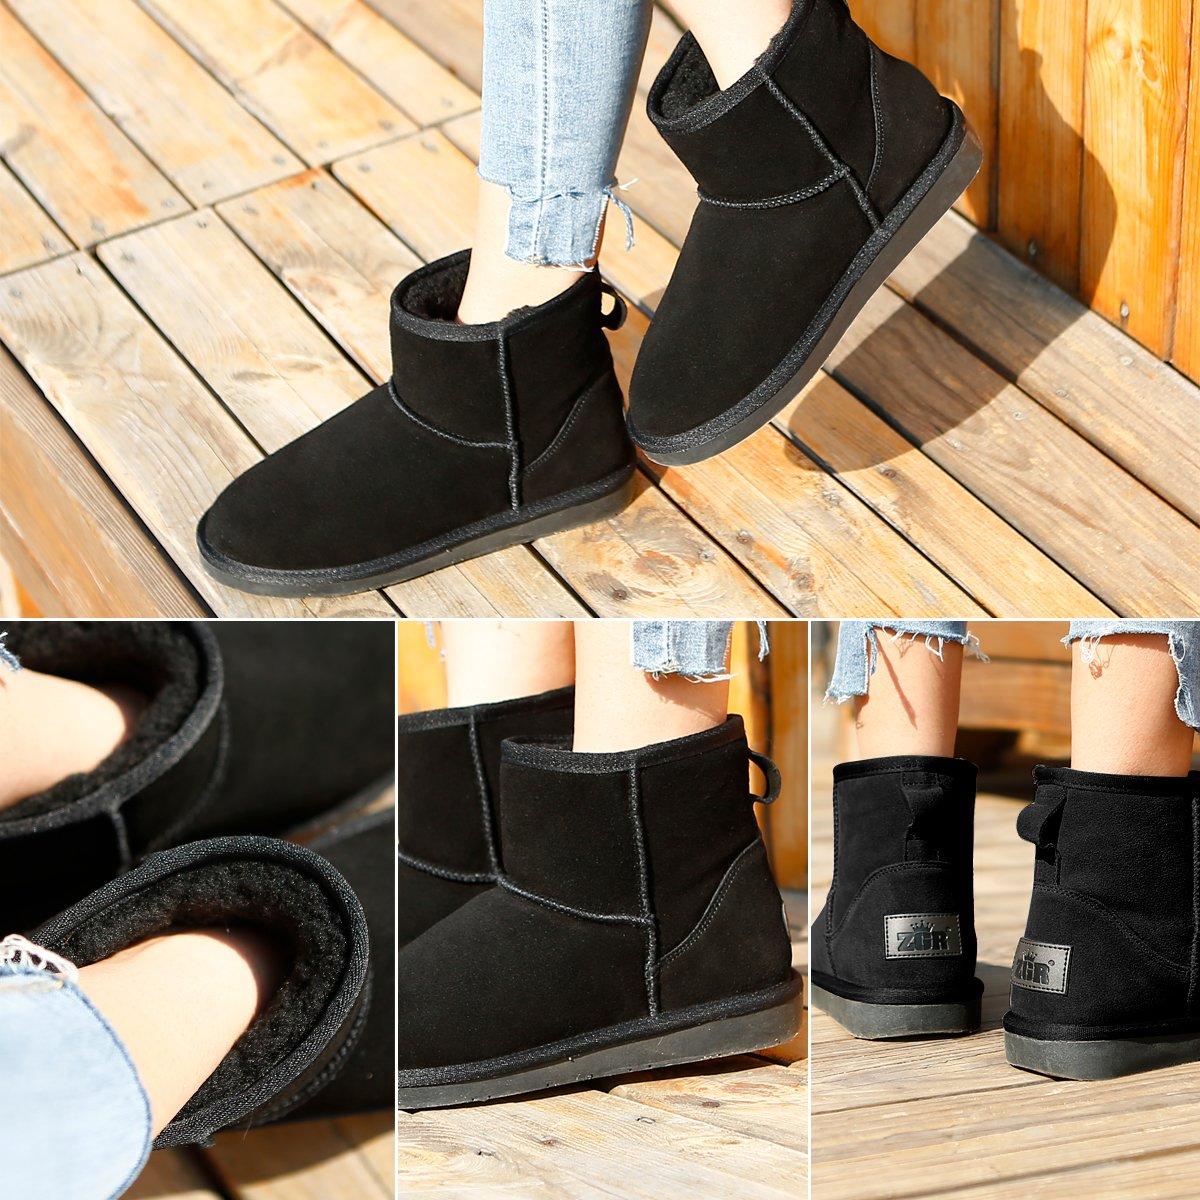 0b4ebc48f Amazon.com | ZGR Womens Short Snow Boots, Winter Fur Lined Ankle ...